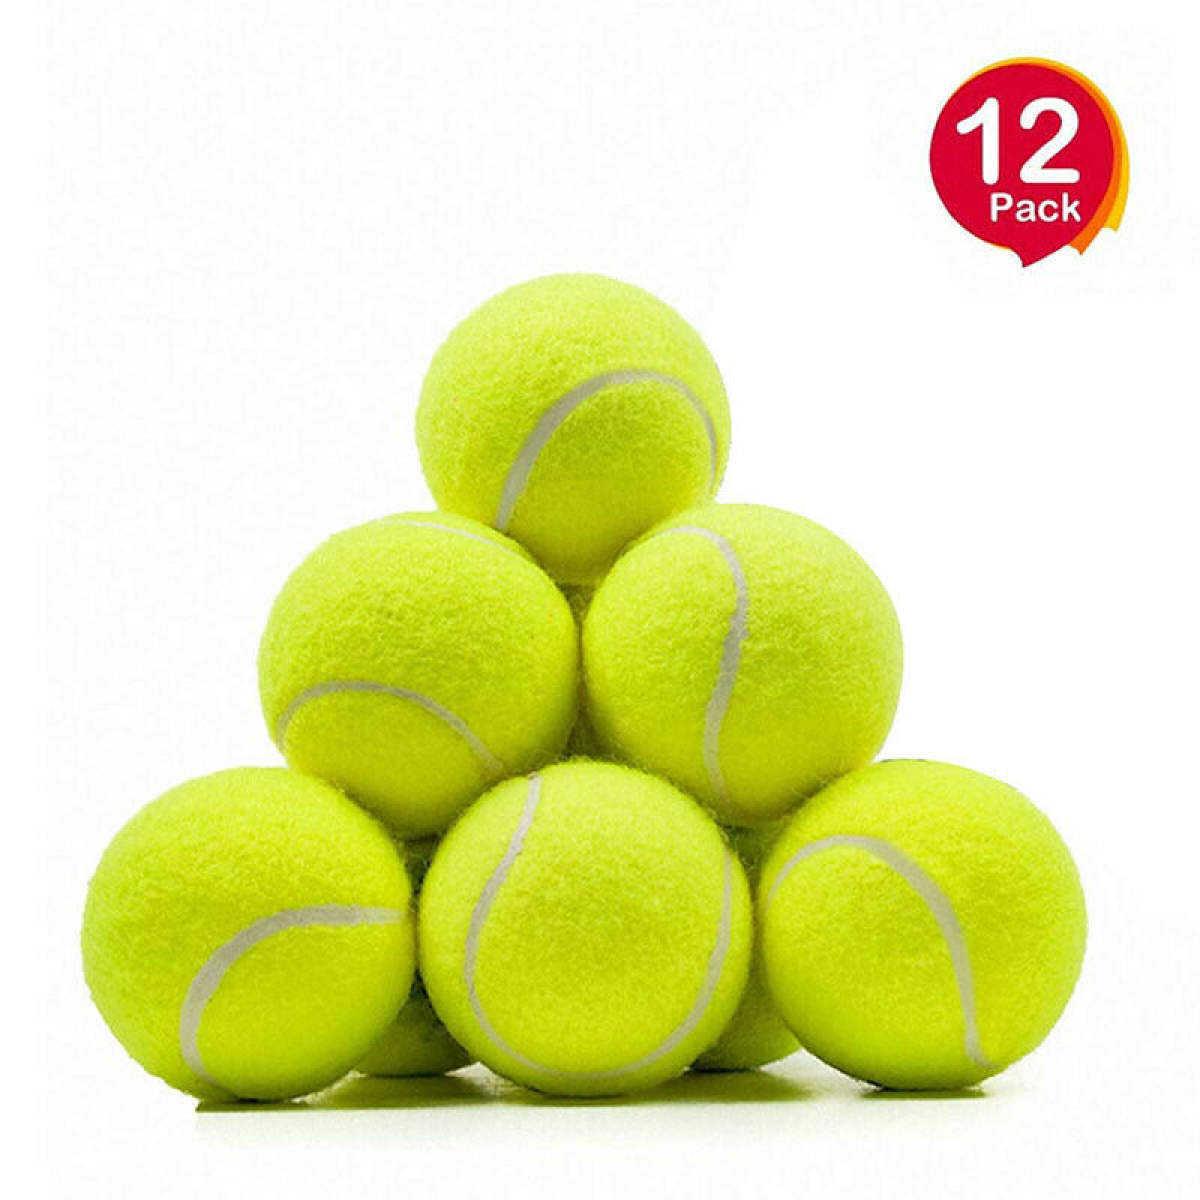 Pack OF 12 - Tennis Balls/Ball For Kids - Cricket Balls Multi color.